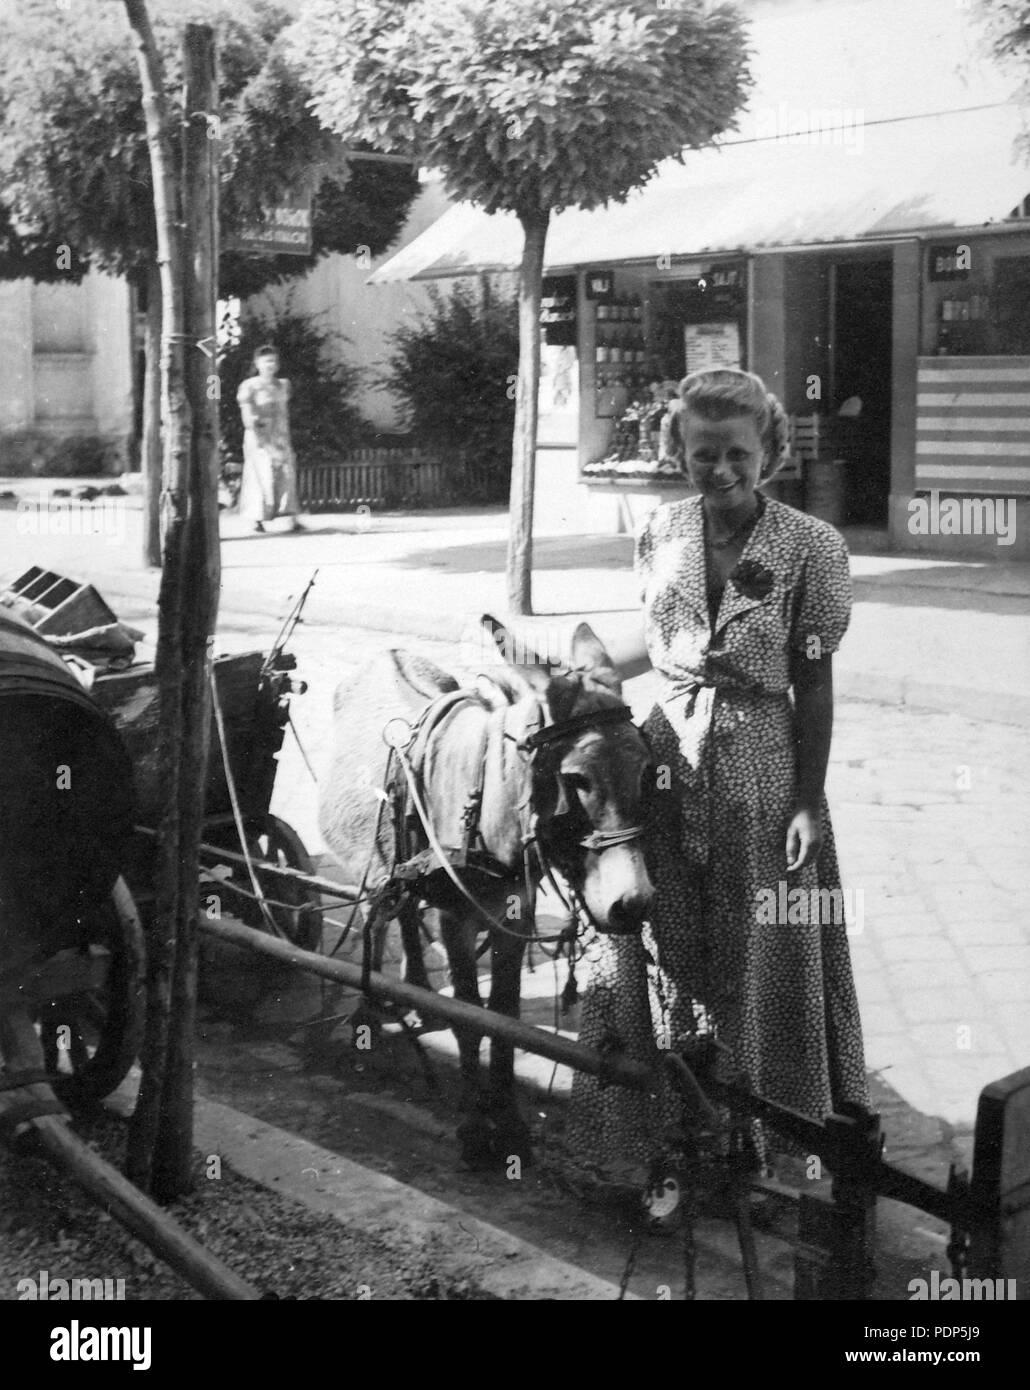 3 Coach, donkey, portrait, woman, street view, scale, barrel, chariot, shop Fortepan 14375 Stock Photo